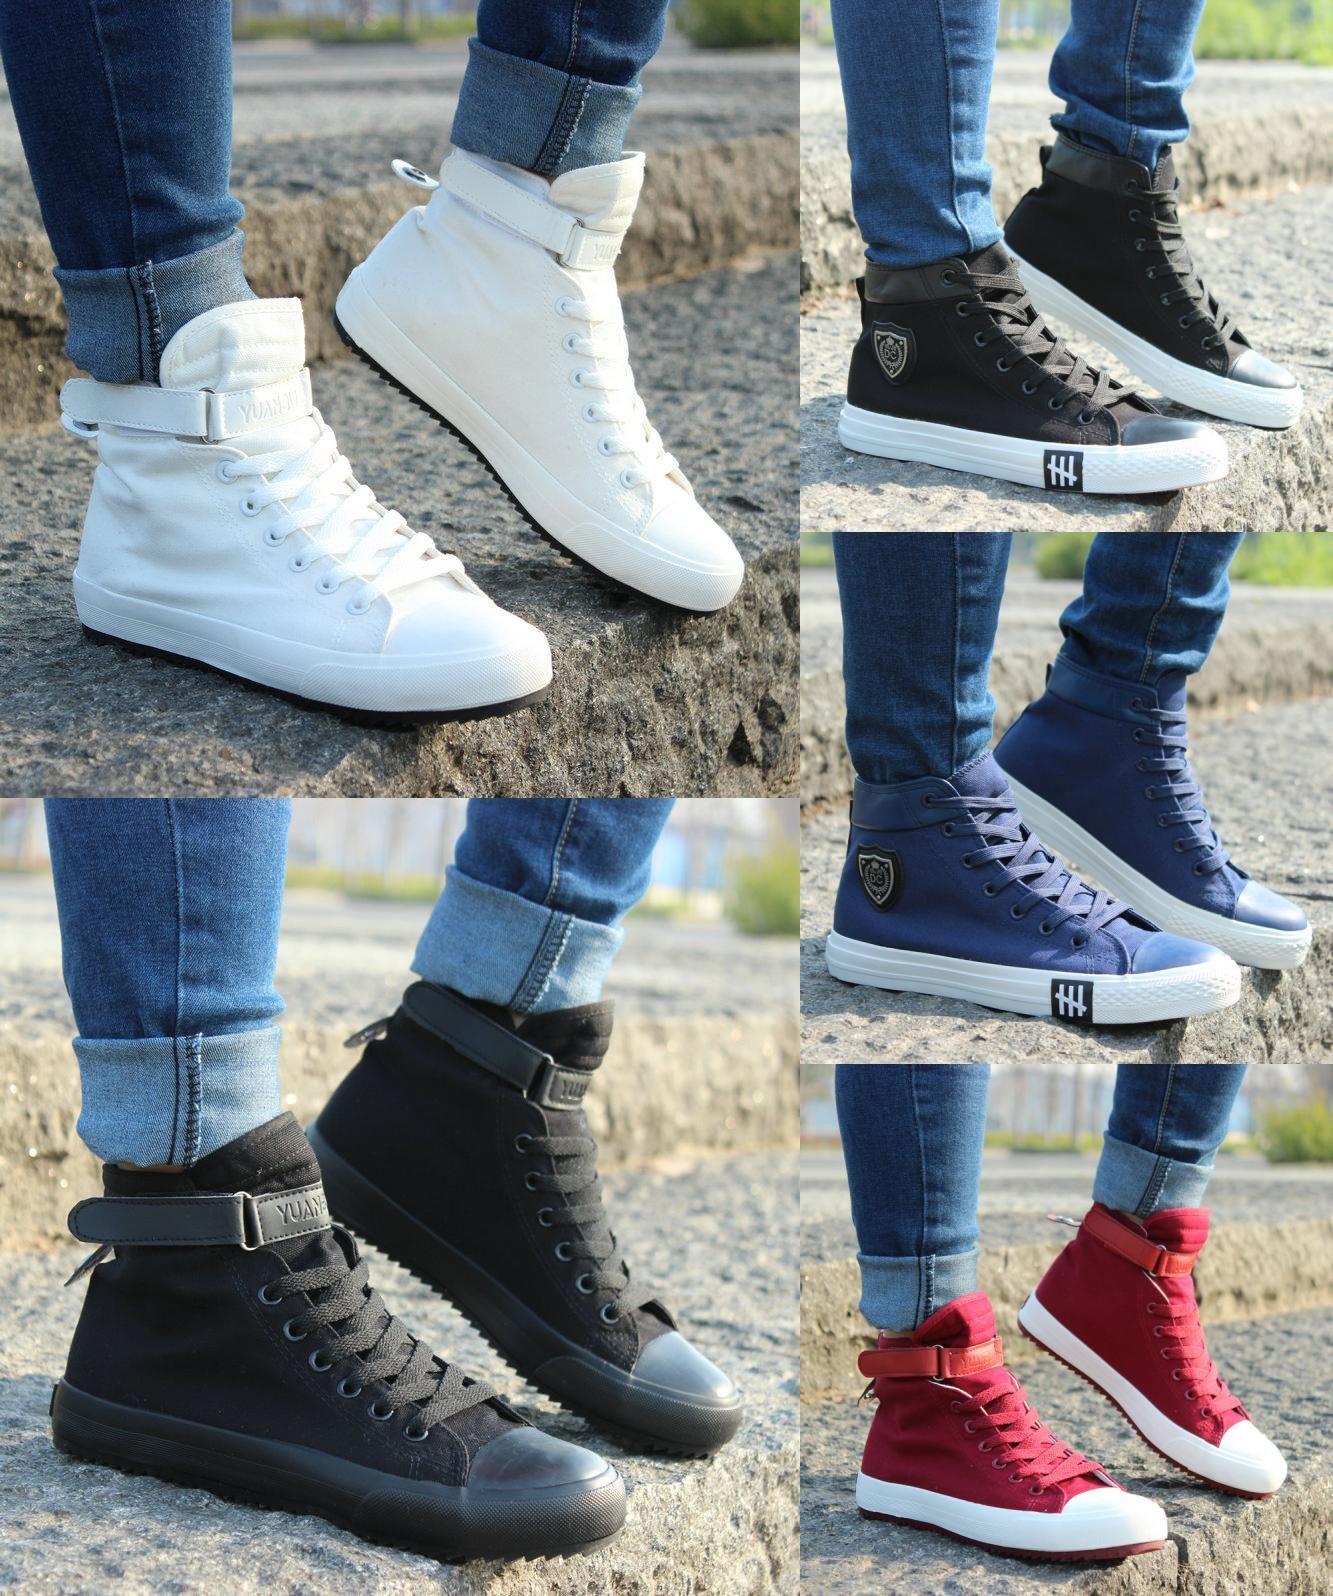 dc2773b46 [Visit to Buy] 2017 New Spring/Autumn Men Casual Shoes Breathable Black High -top Lace-up Canvas Shoes Espadrilles Fashion White Men's Flats  #Advertisement